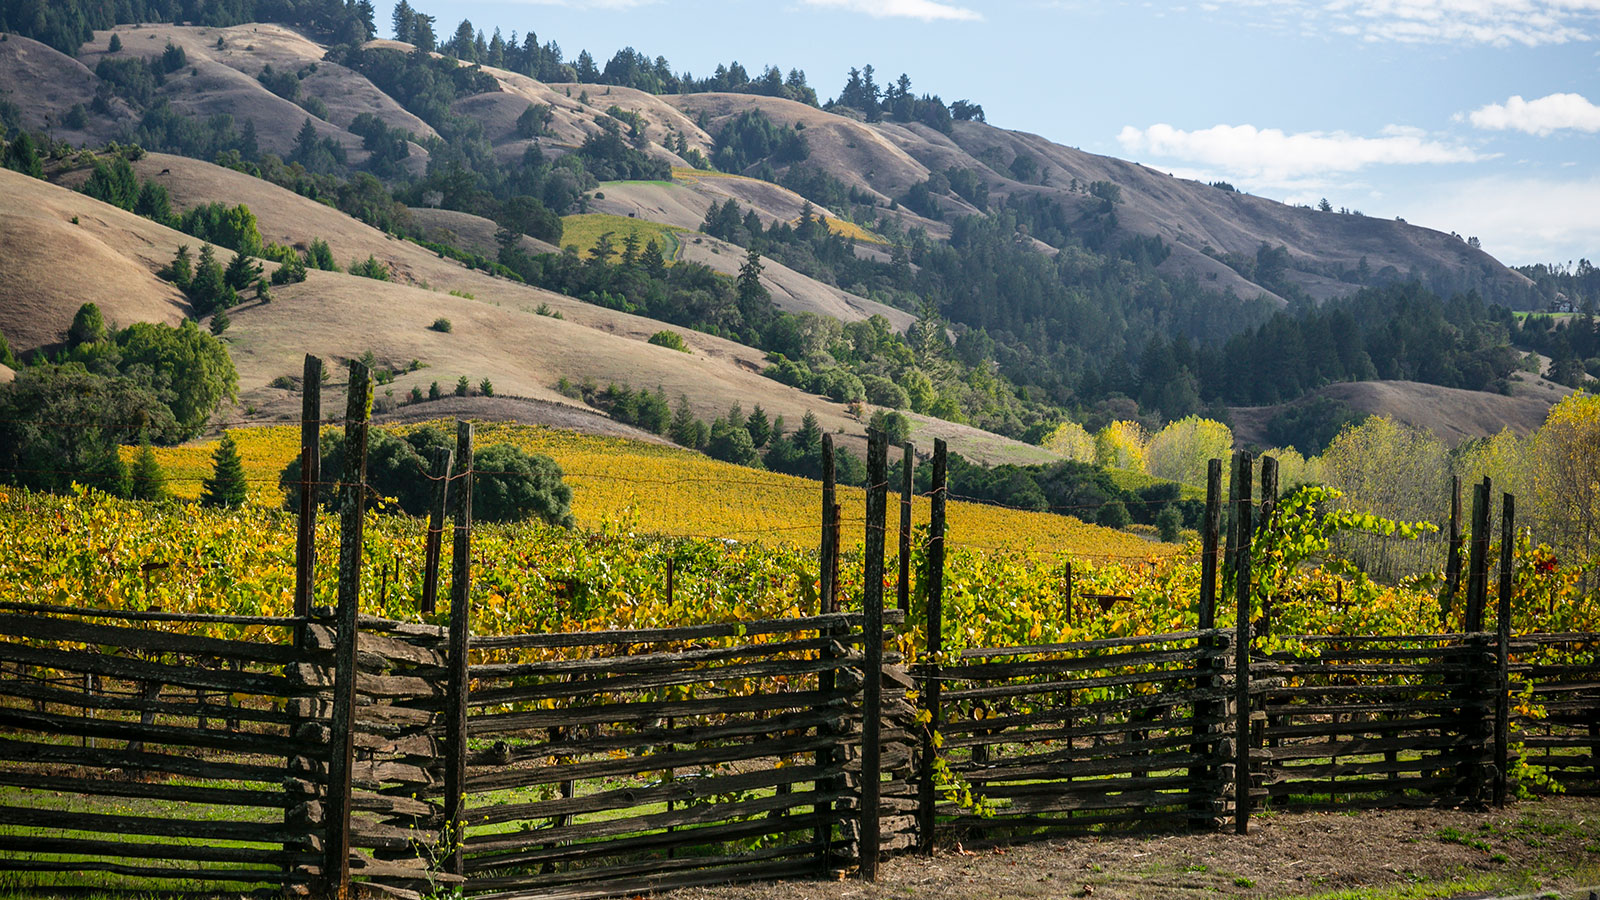 Wine Refrigerator Reviews Wine Spectator 14 california white wines not to overlook | tasting highlights